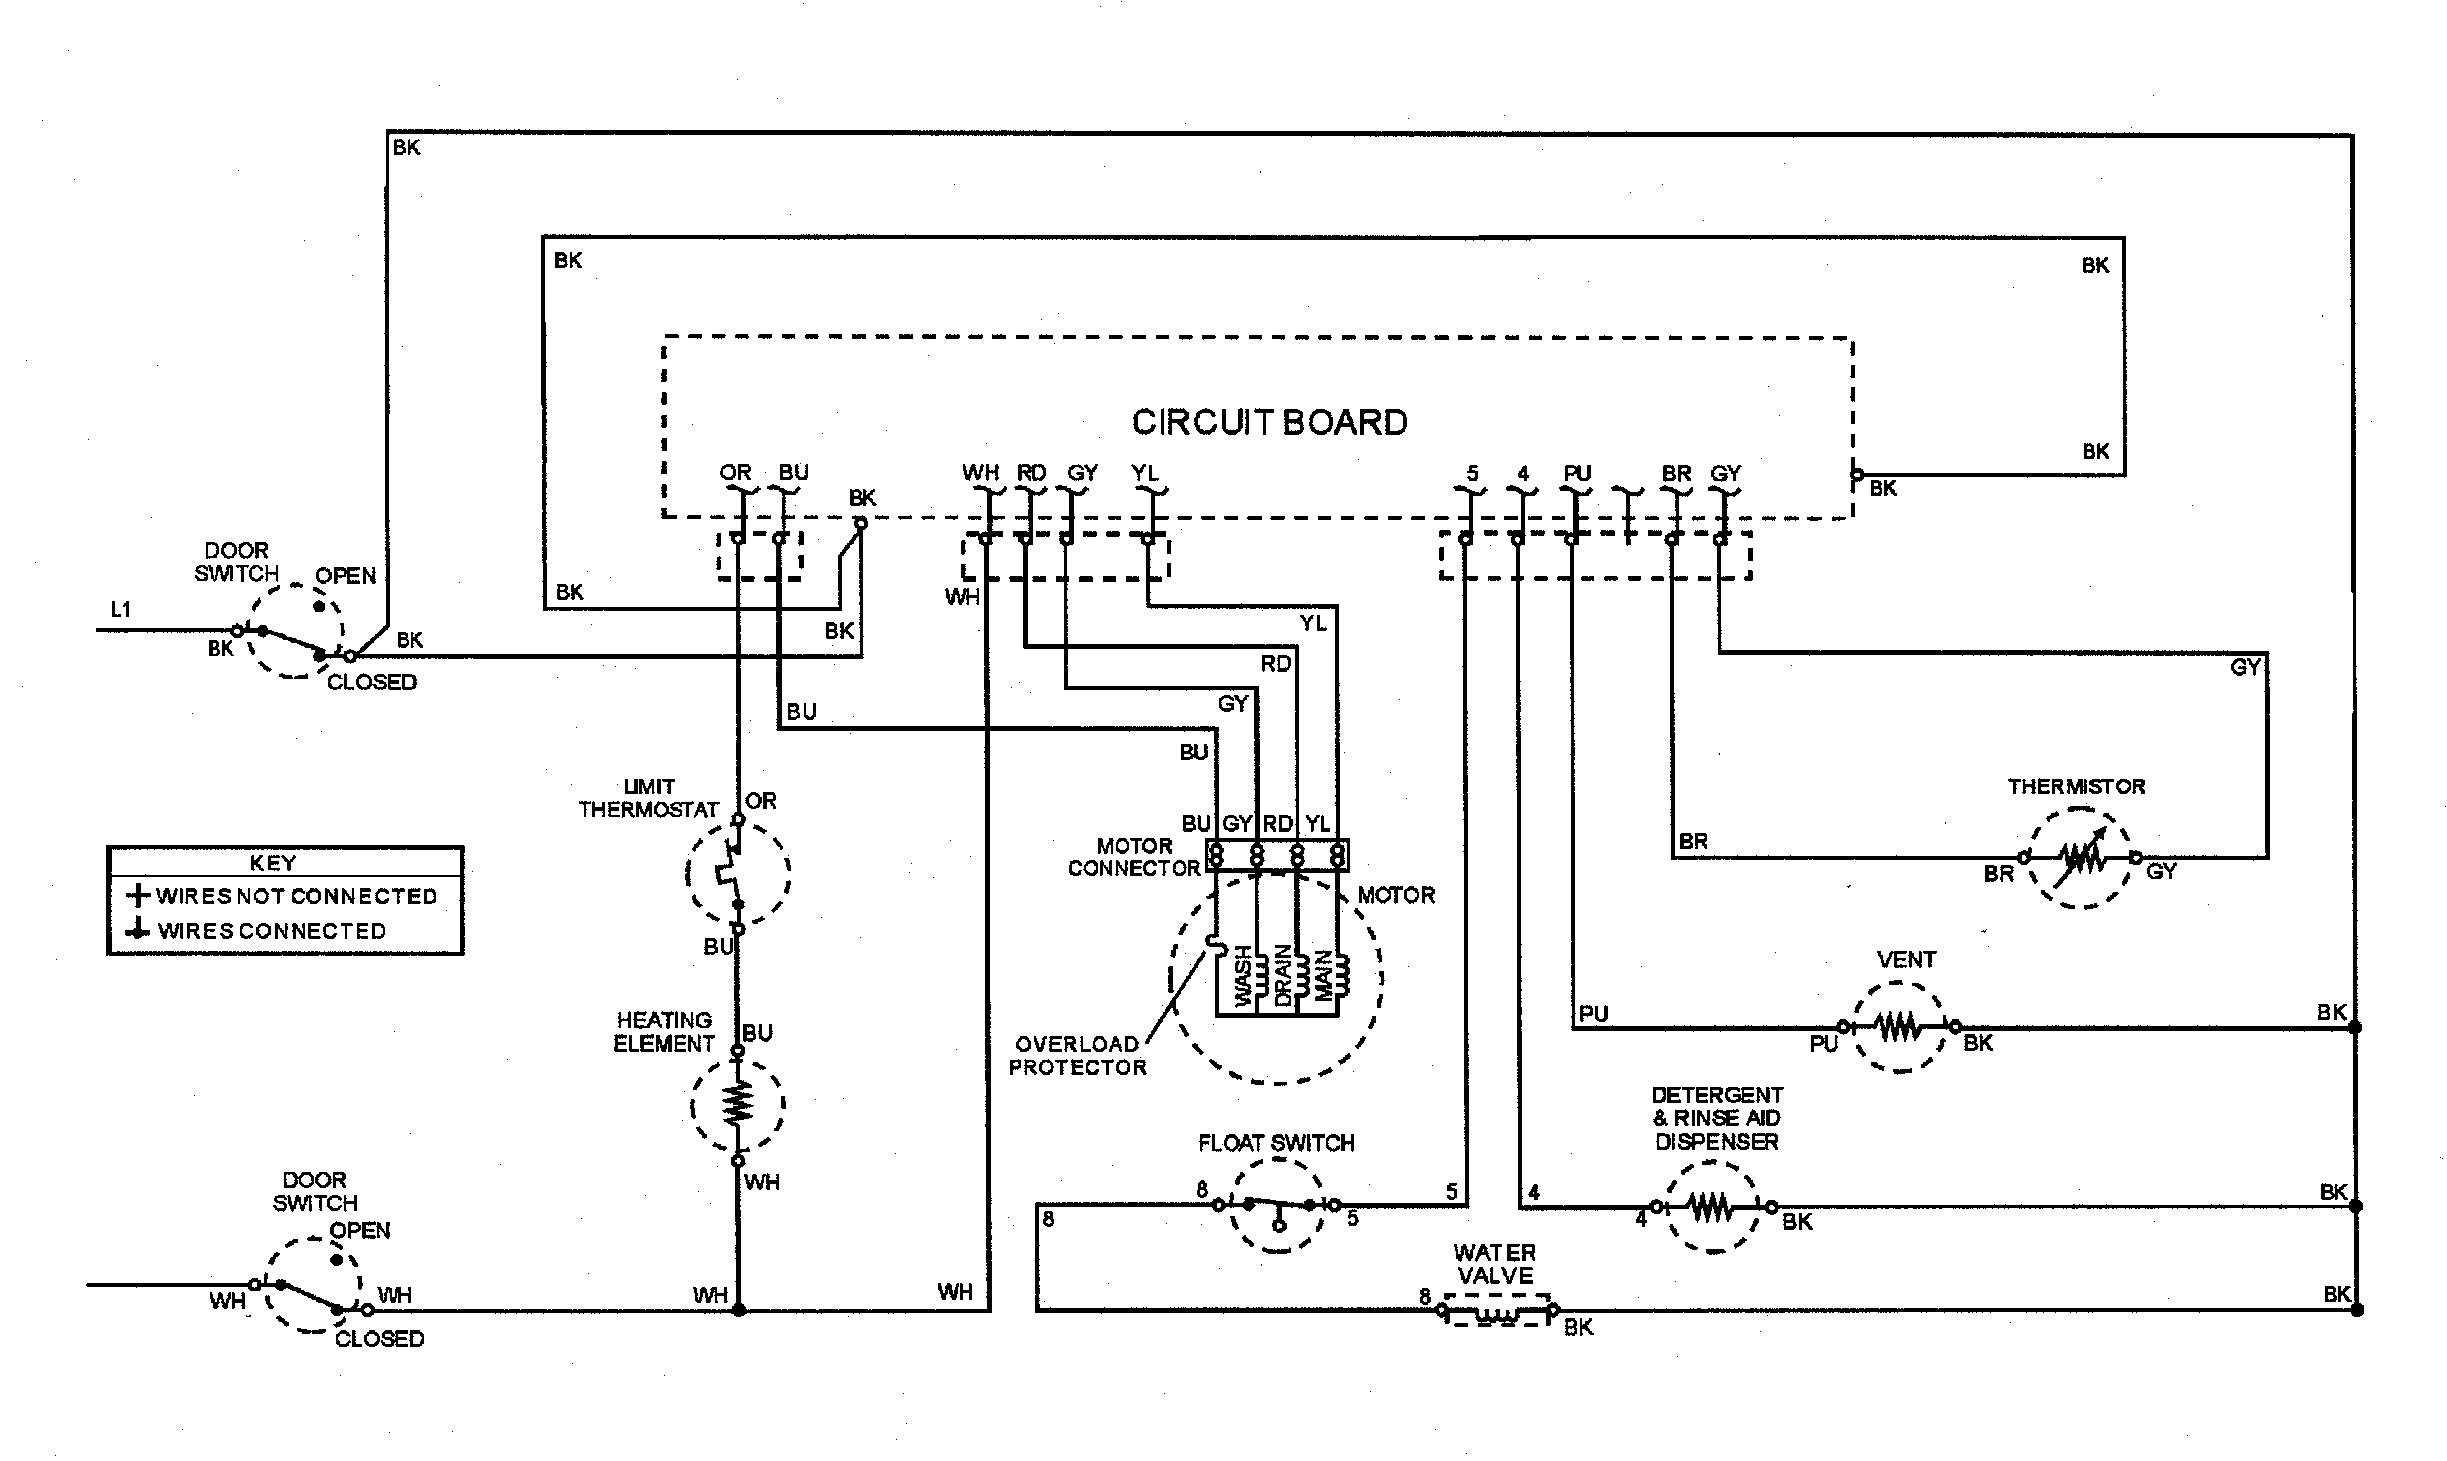 DIAGRAM] Viper Model 4115v1 Wiring Diagram FULL Version HD Quality Wiring  Diagram - PEAKDIAGRAM.HELENE-COIFFURE-ROUEN.FRpeakdiagram.helene-coiffure-rouen.fr